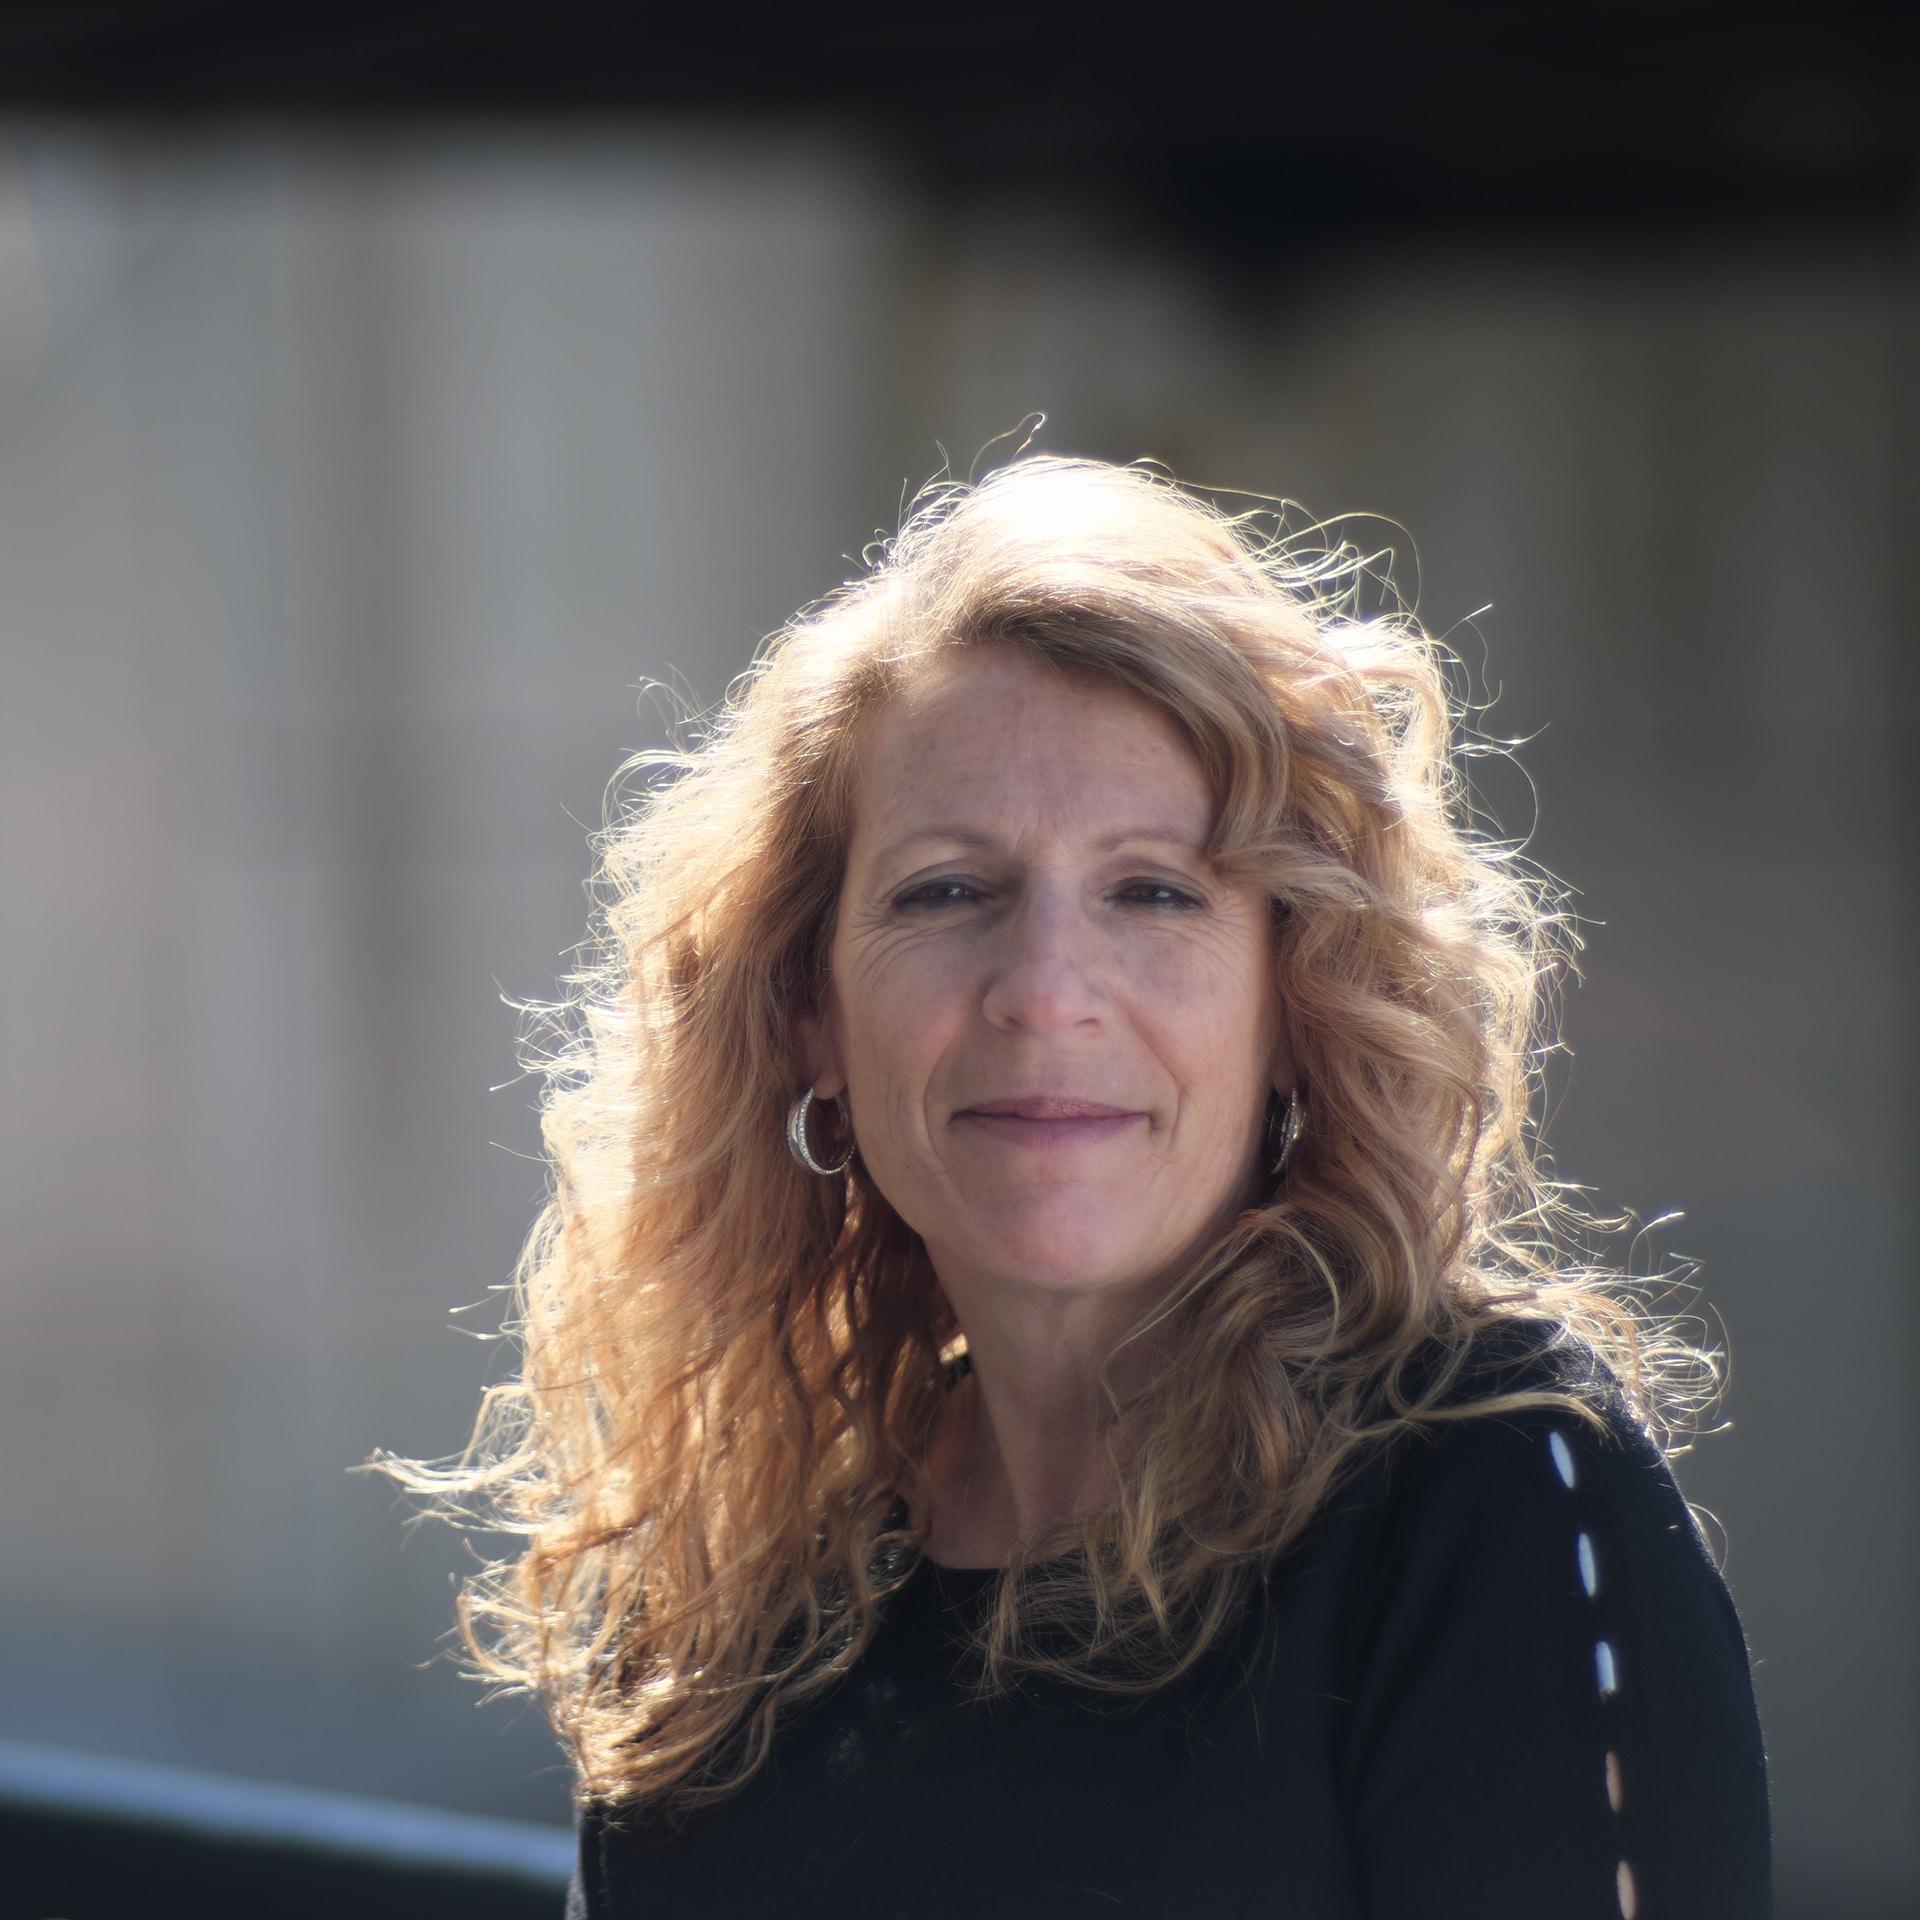 Cathy Shea - Technology Revealed